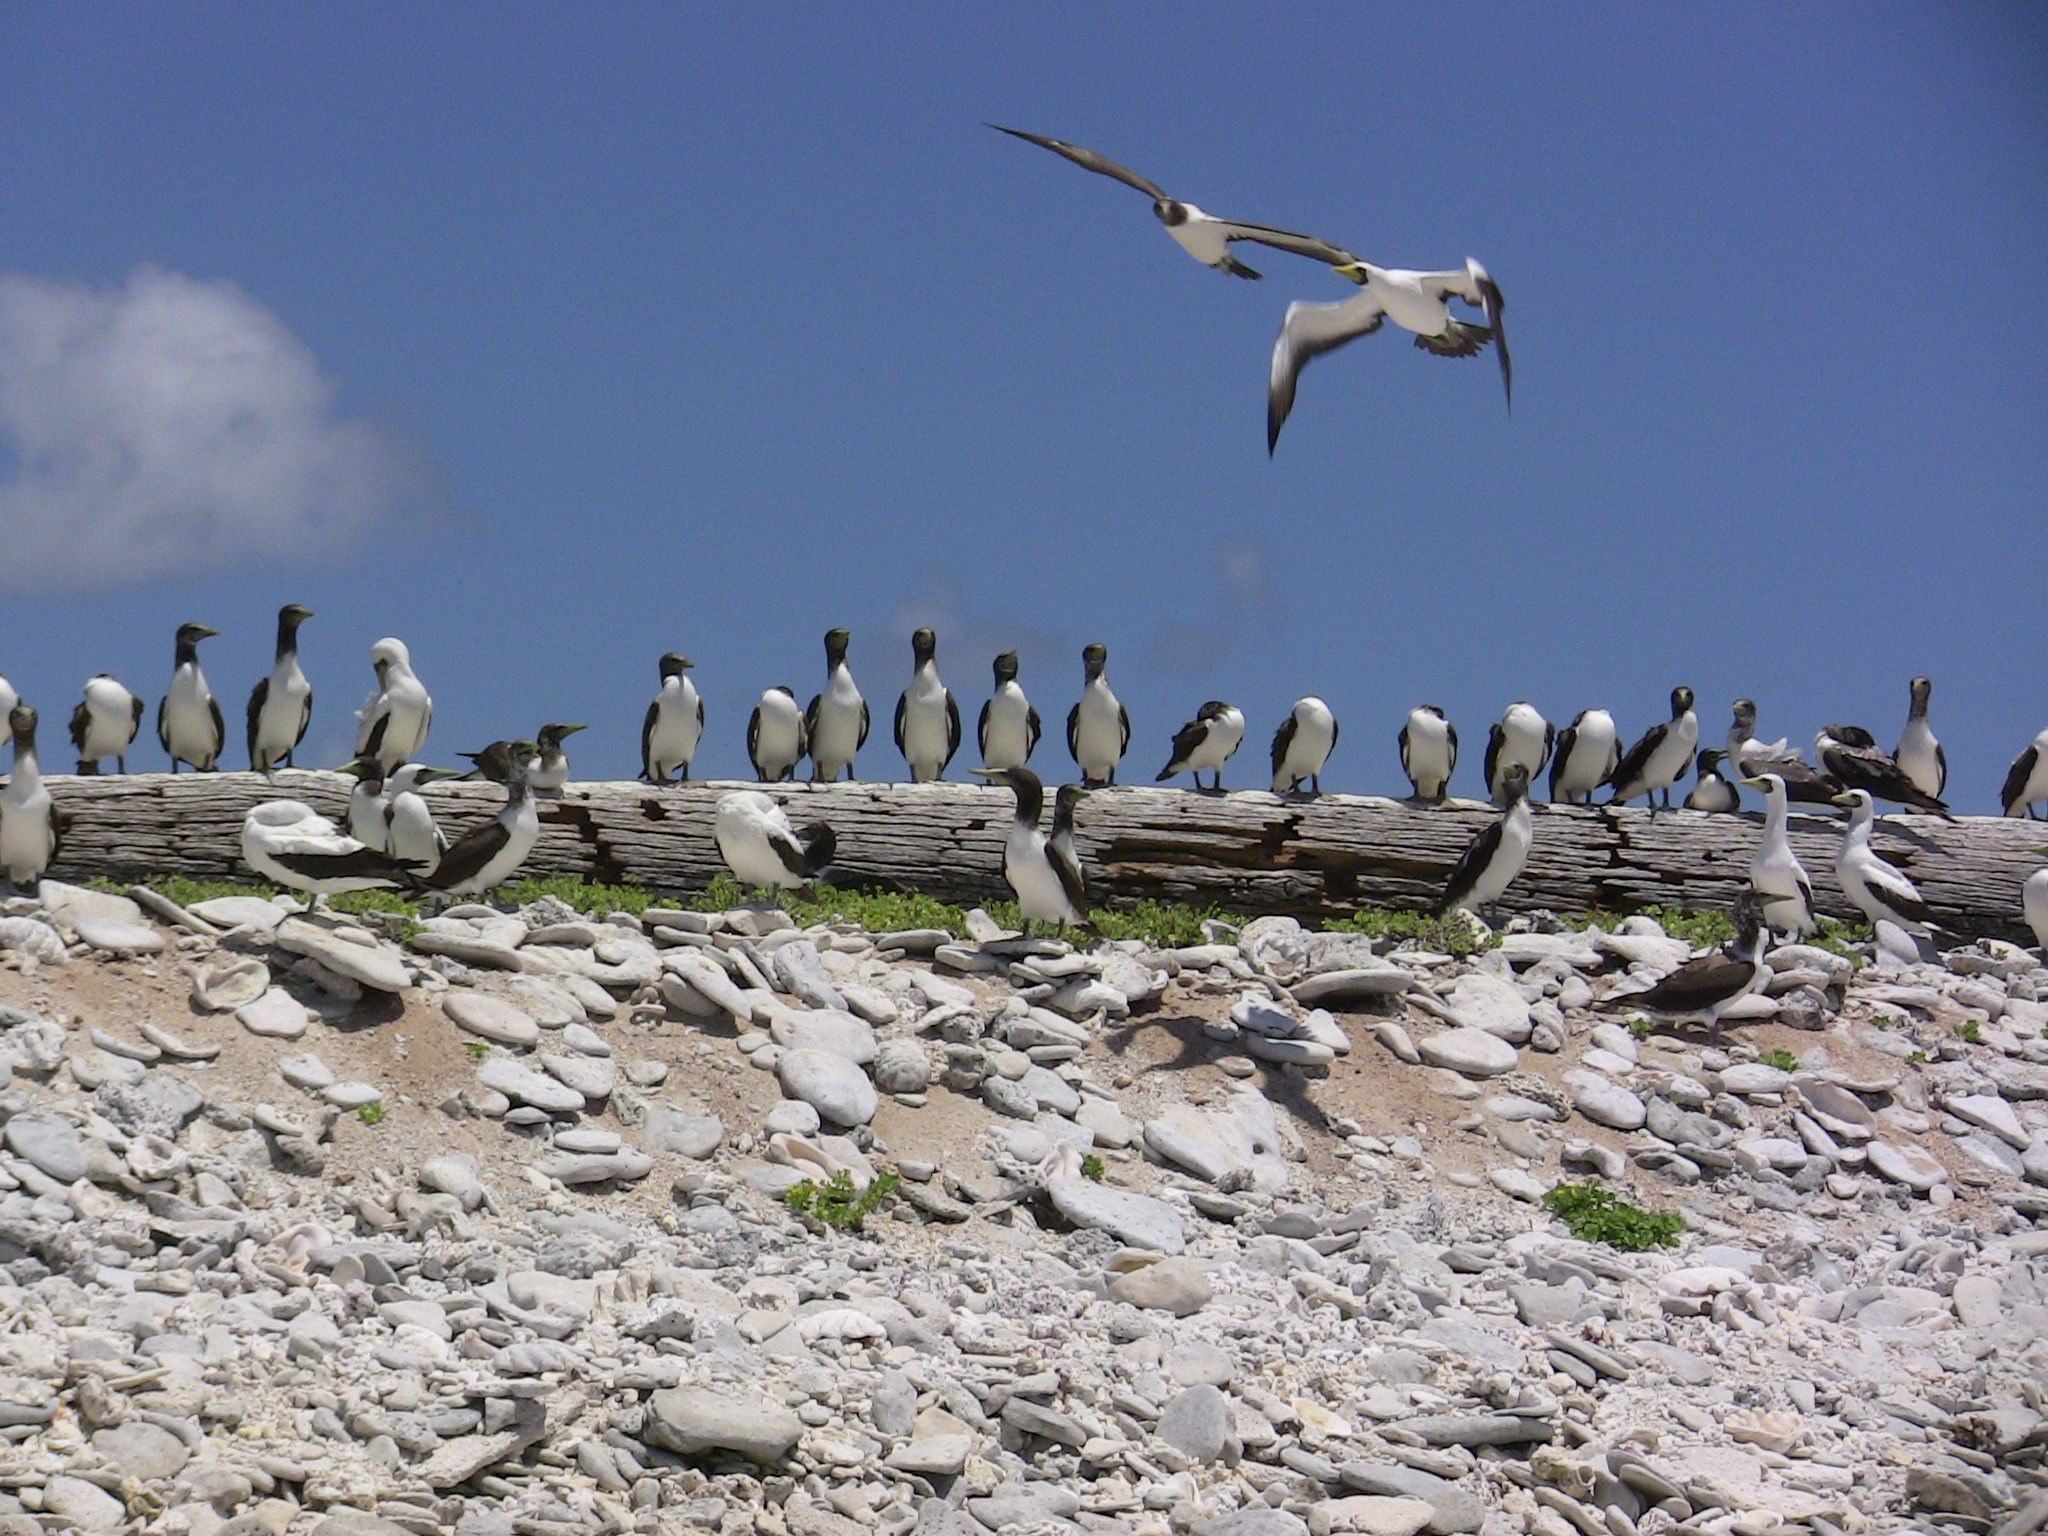 islas howland 8